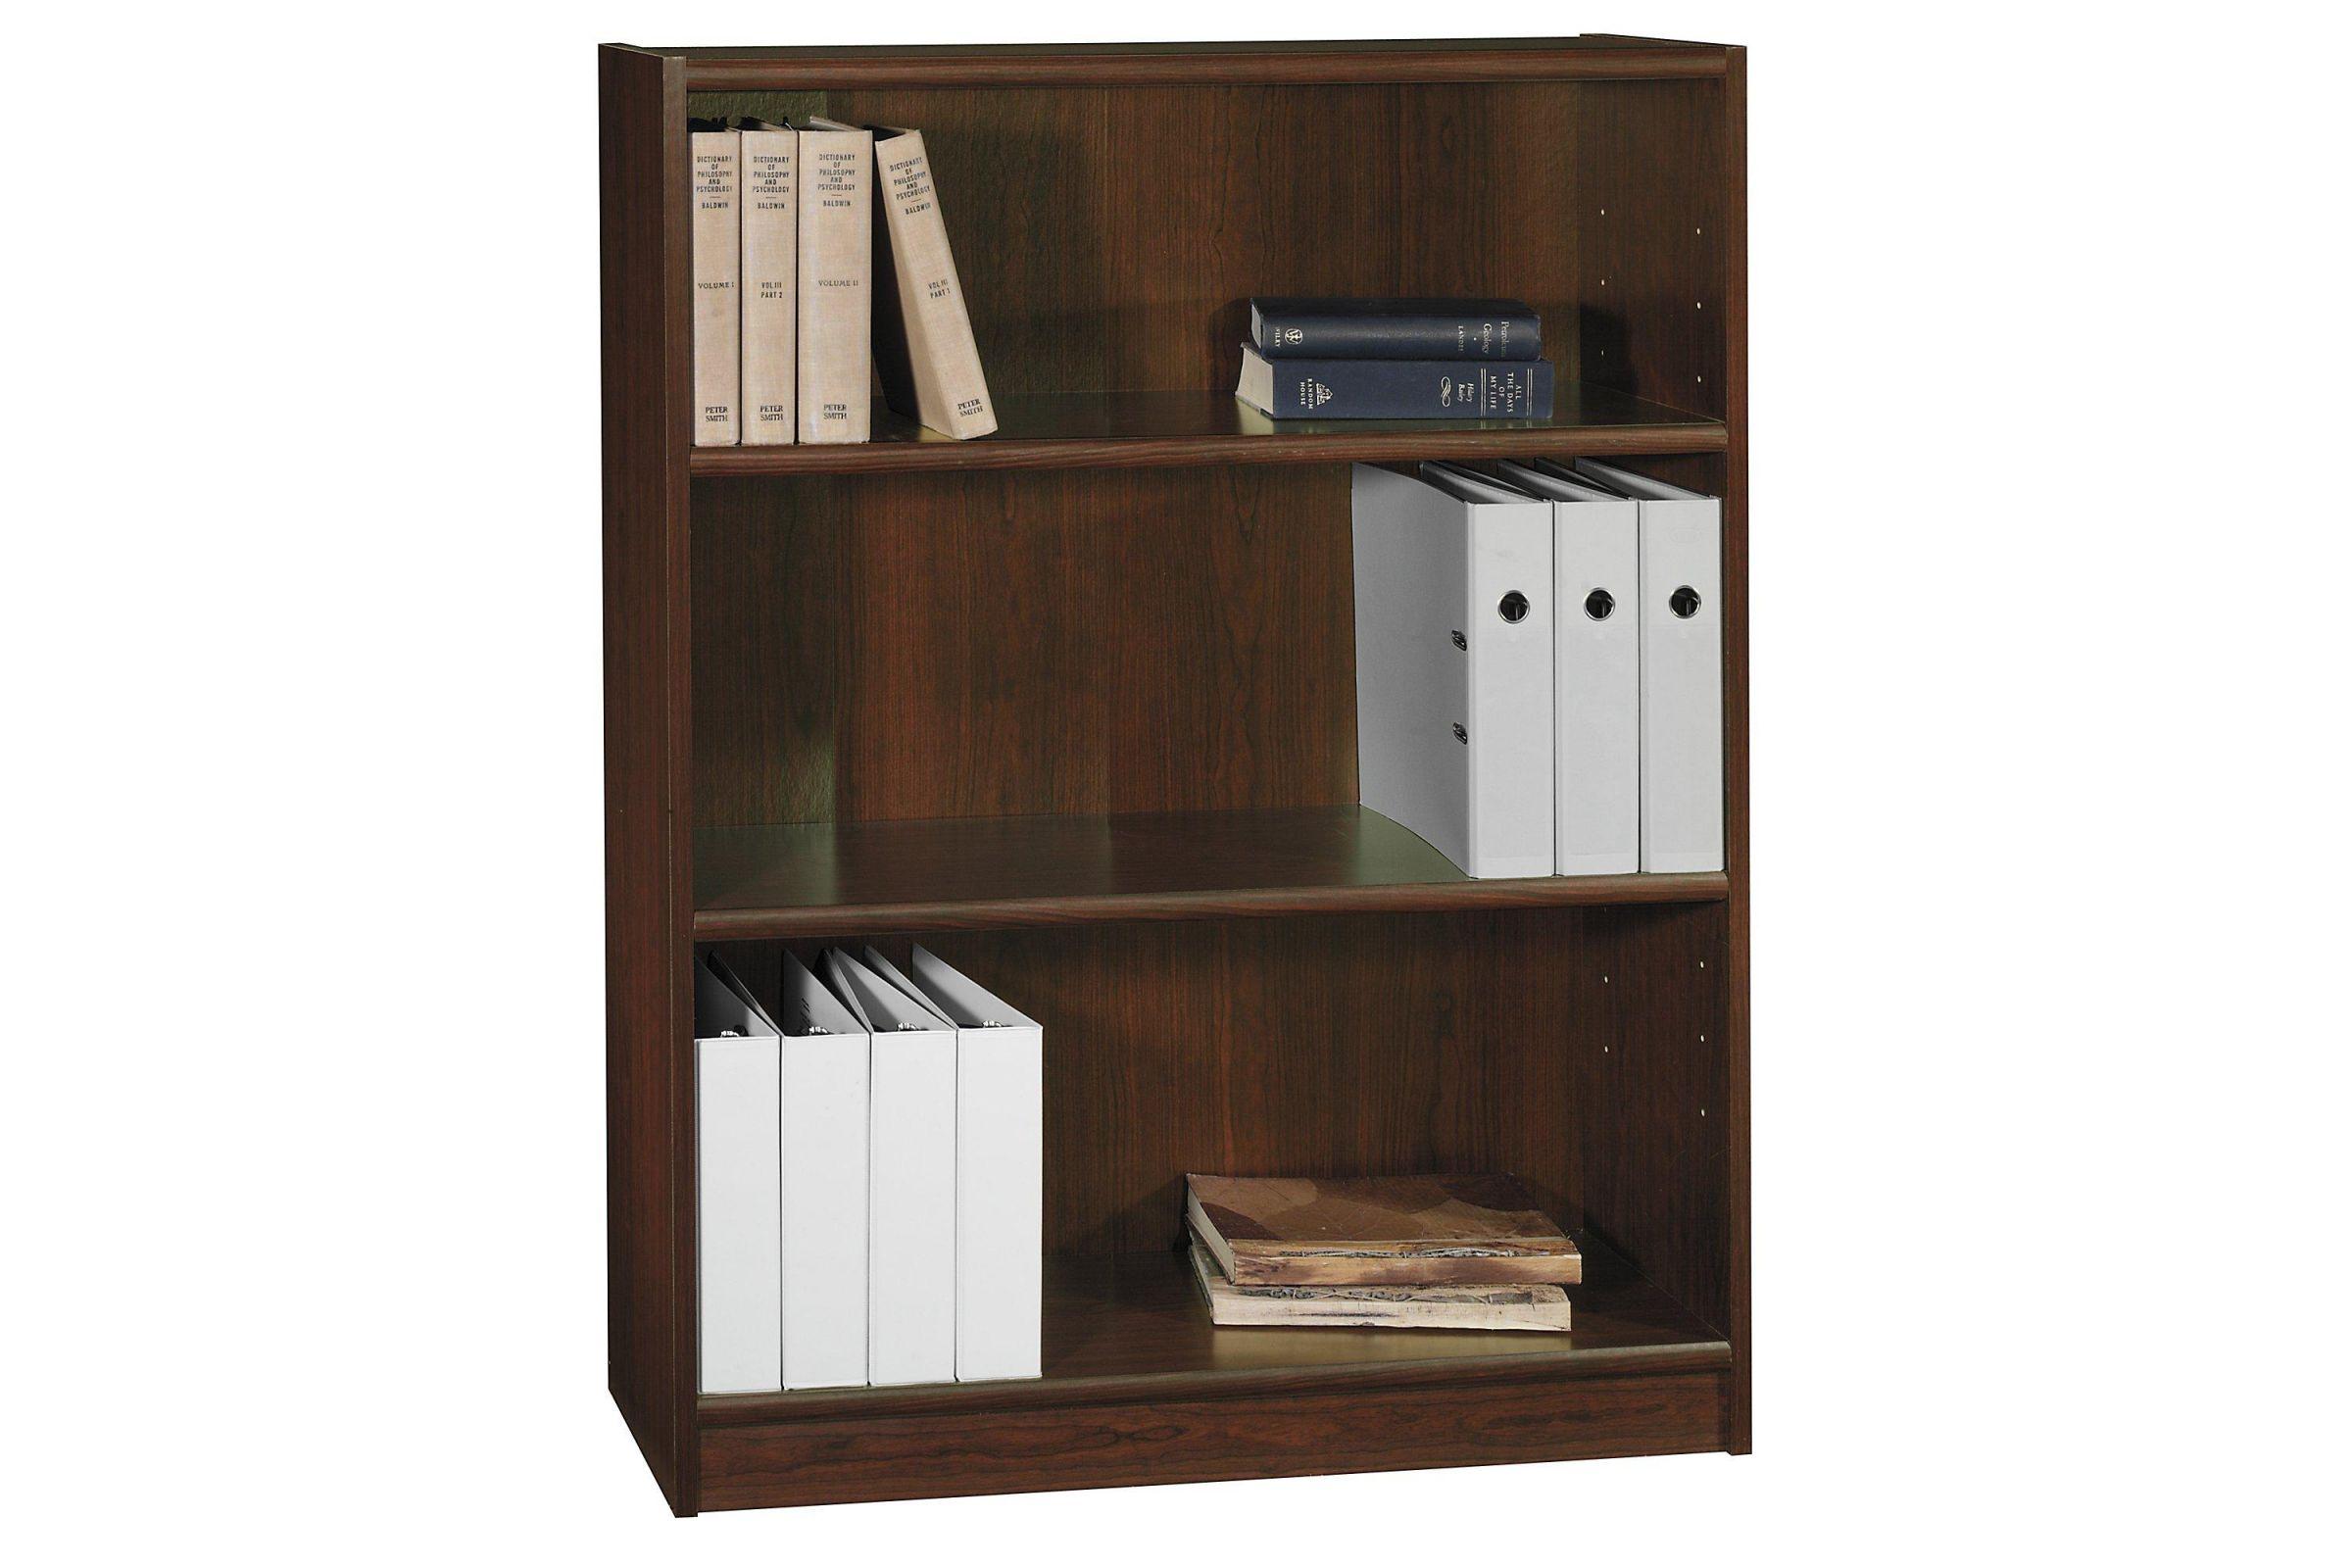 Bush Universal 3 Shelf Wood Bookcase in Vogue Cherry